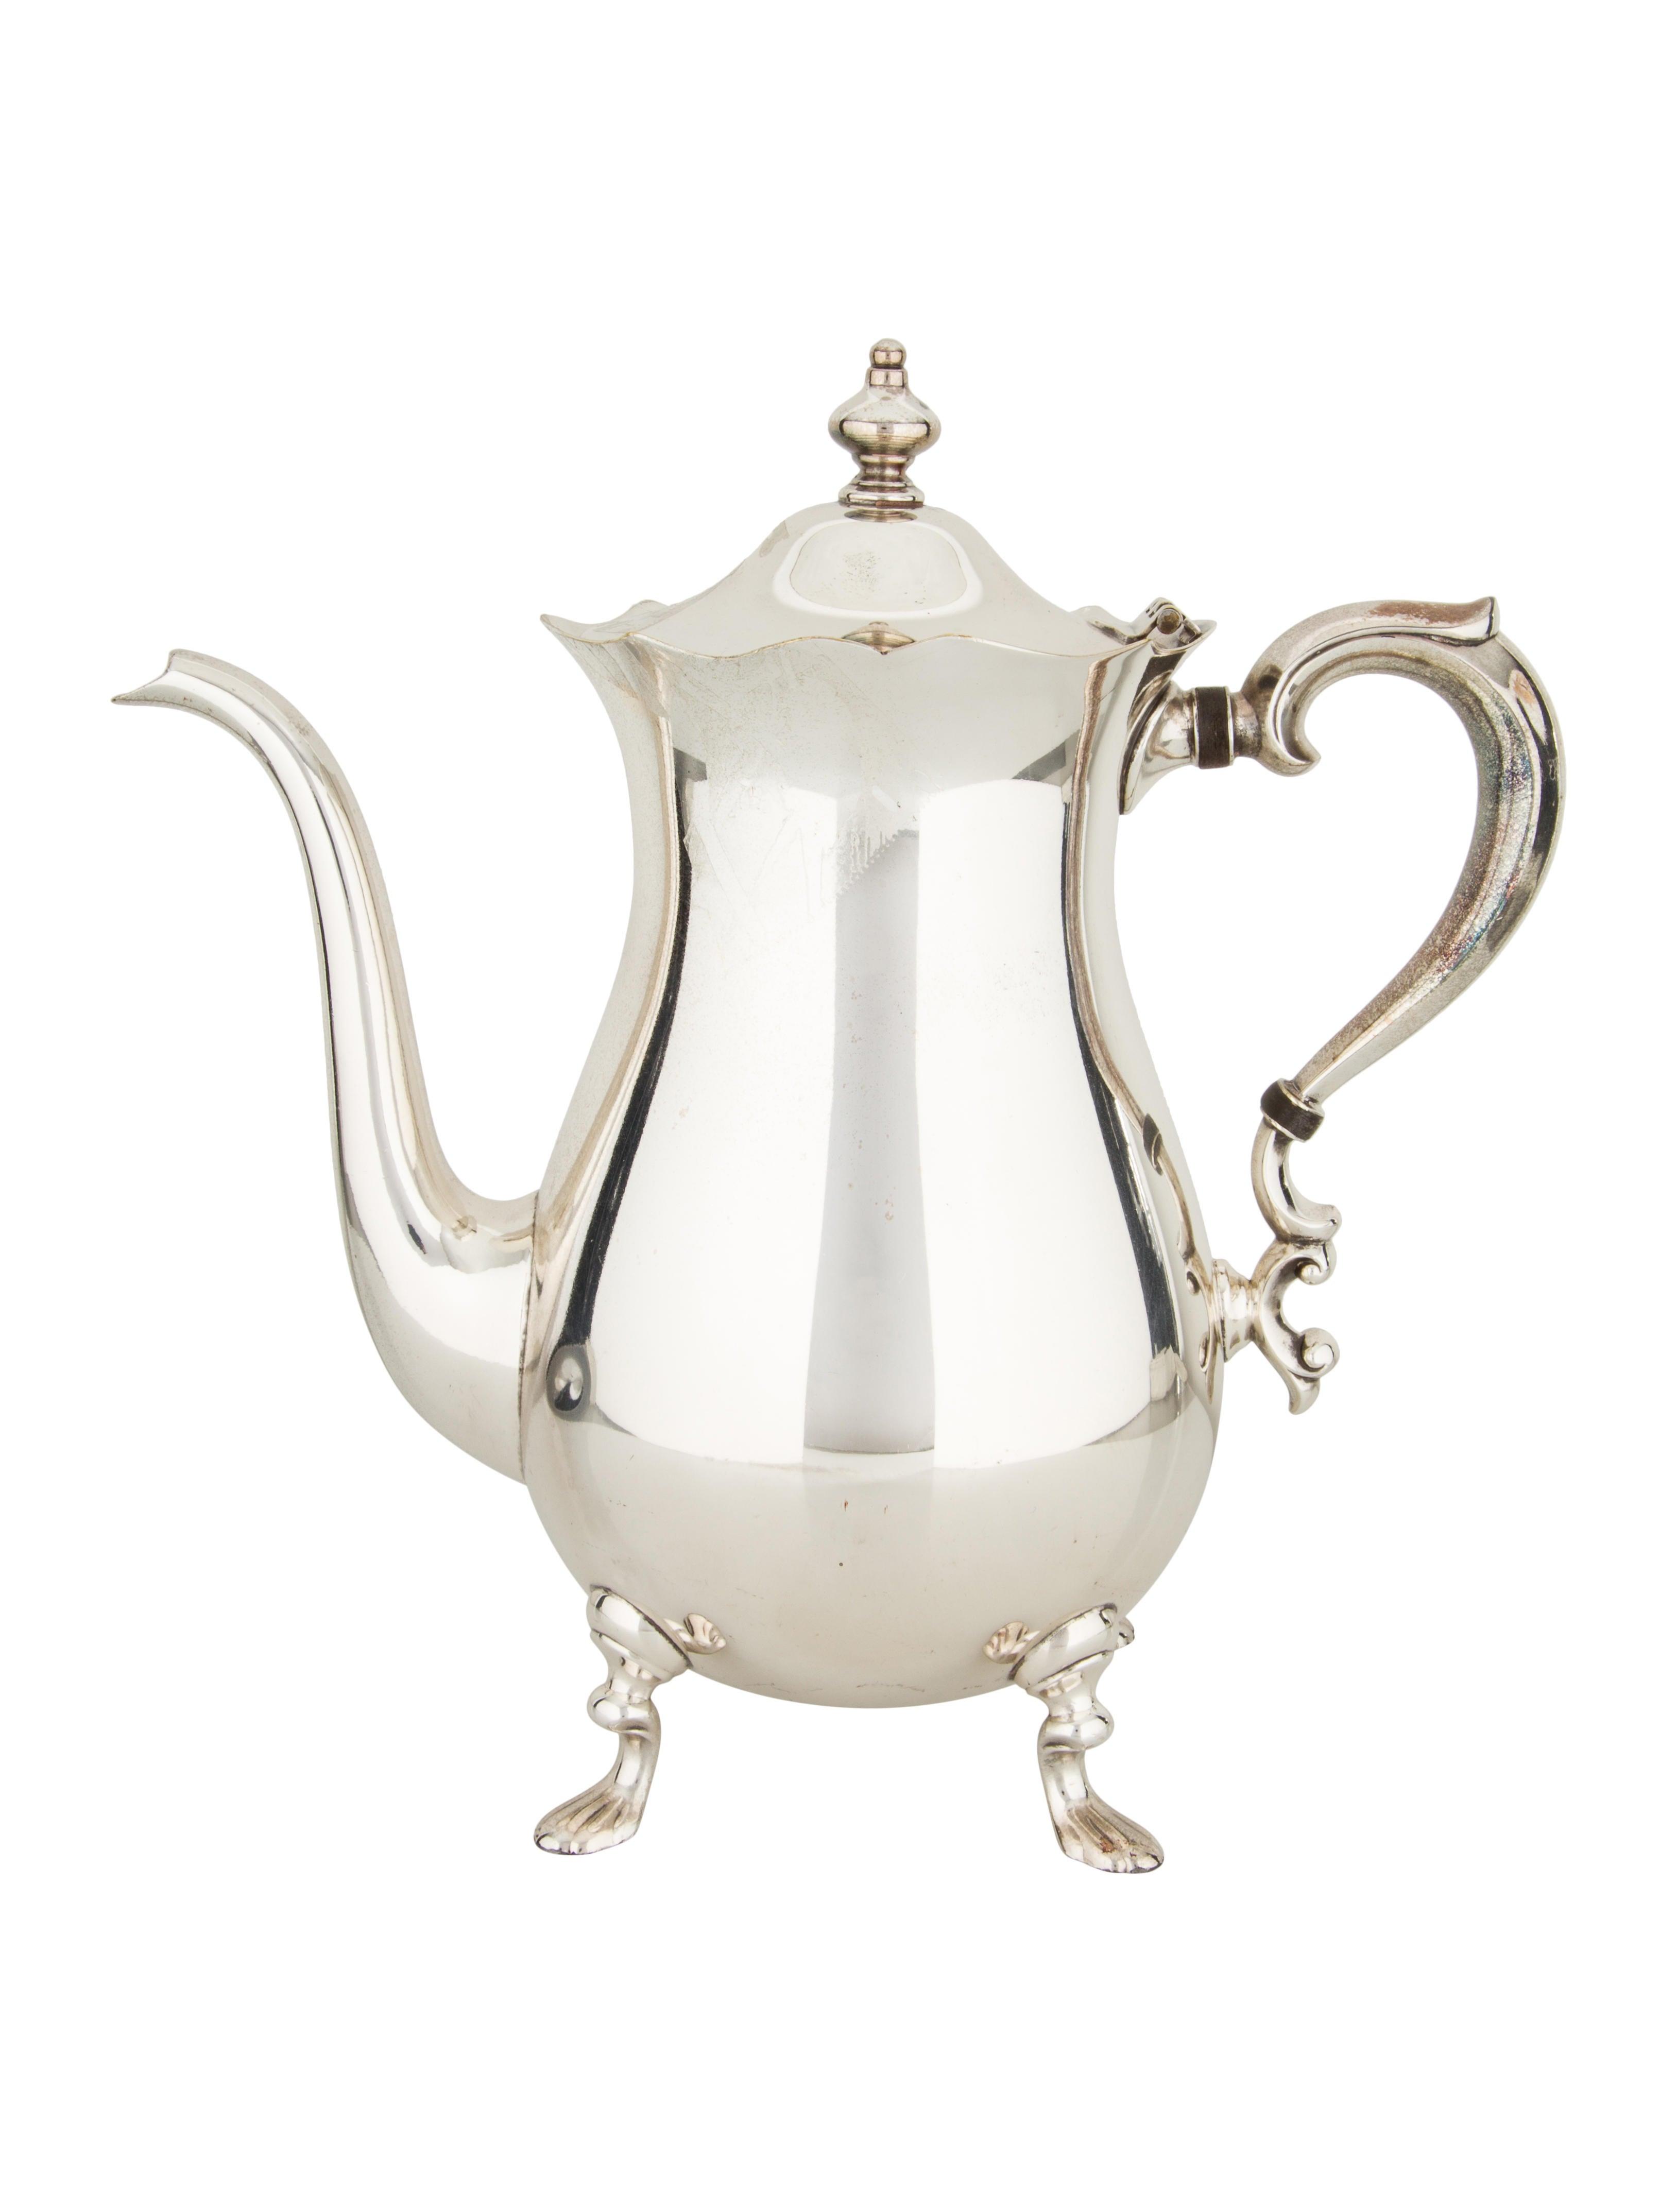 Towle 5-Piece Silverplate Tea & Coffee Service